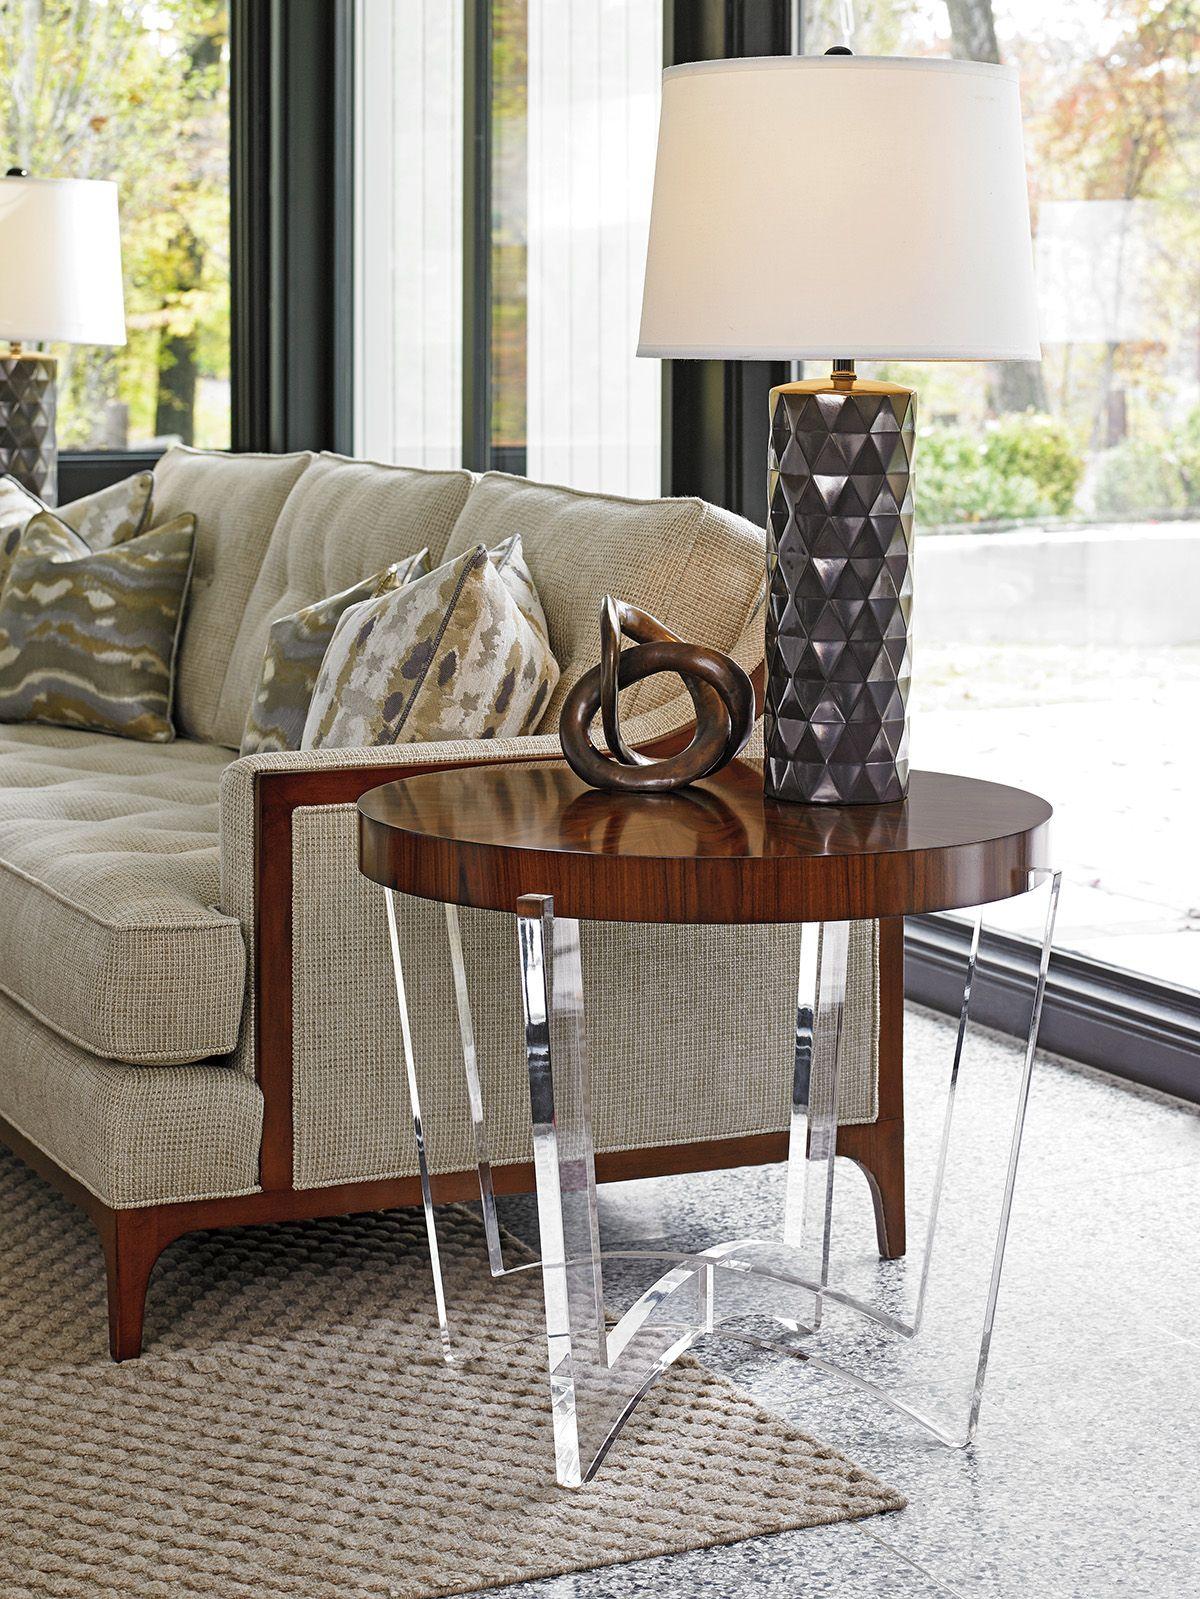 item tables items furniture westwood home rectangular place detail table lexington dining type kensington